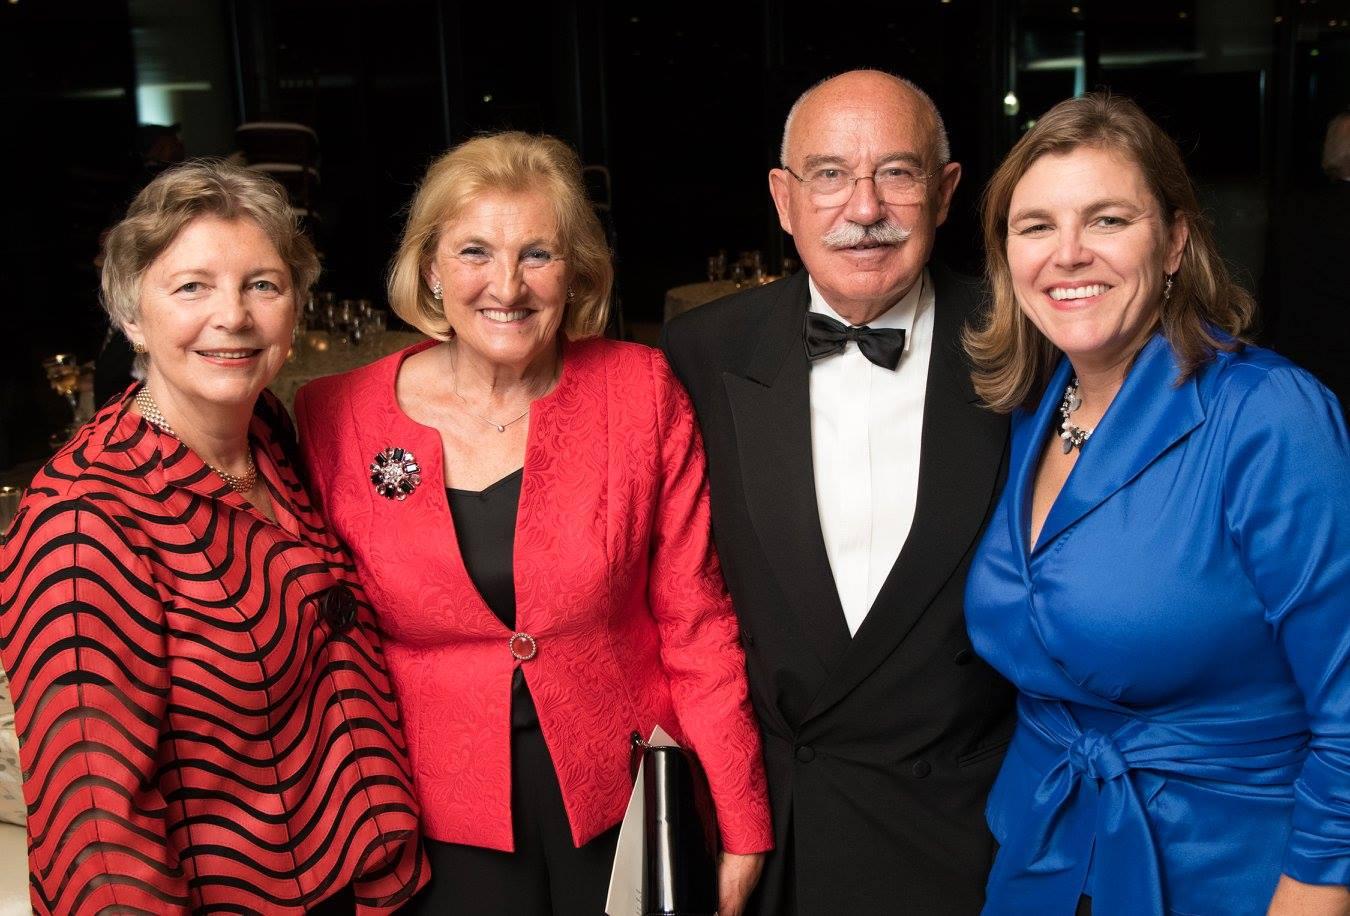 Mrs. Edith Lauer, Dr. Rozália Rábai, Dr. János Martonyi, Coalition VP Andrea Lauer Rice